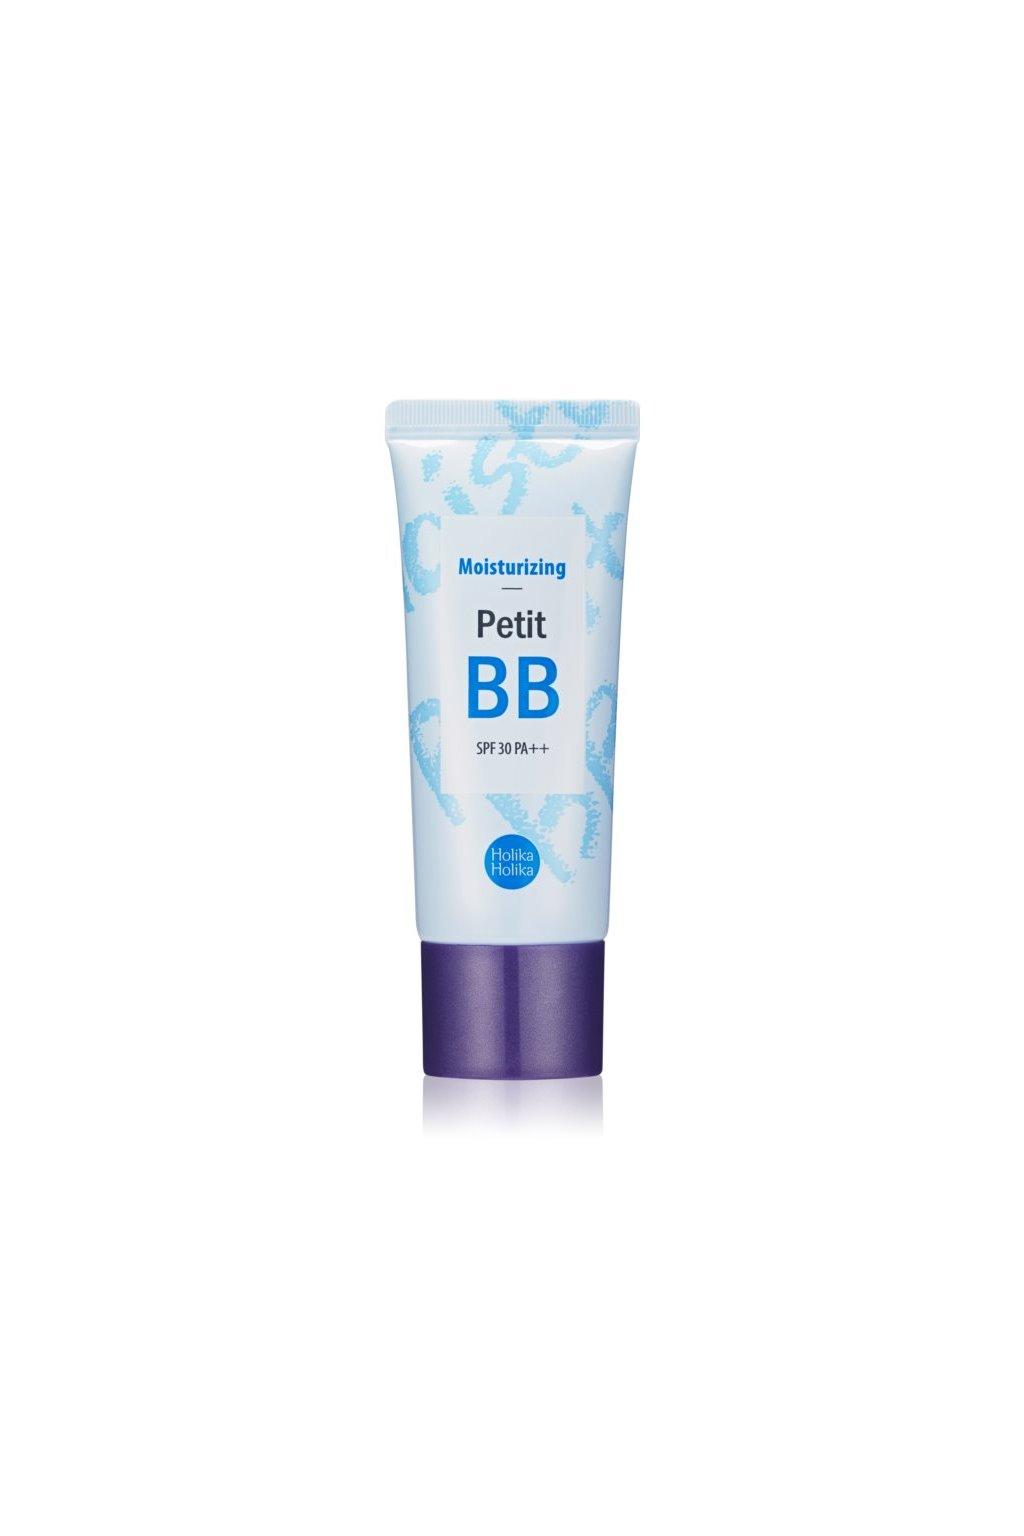 holika holika petit bb moisturizing hydratacni bb krem spf 30